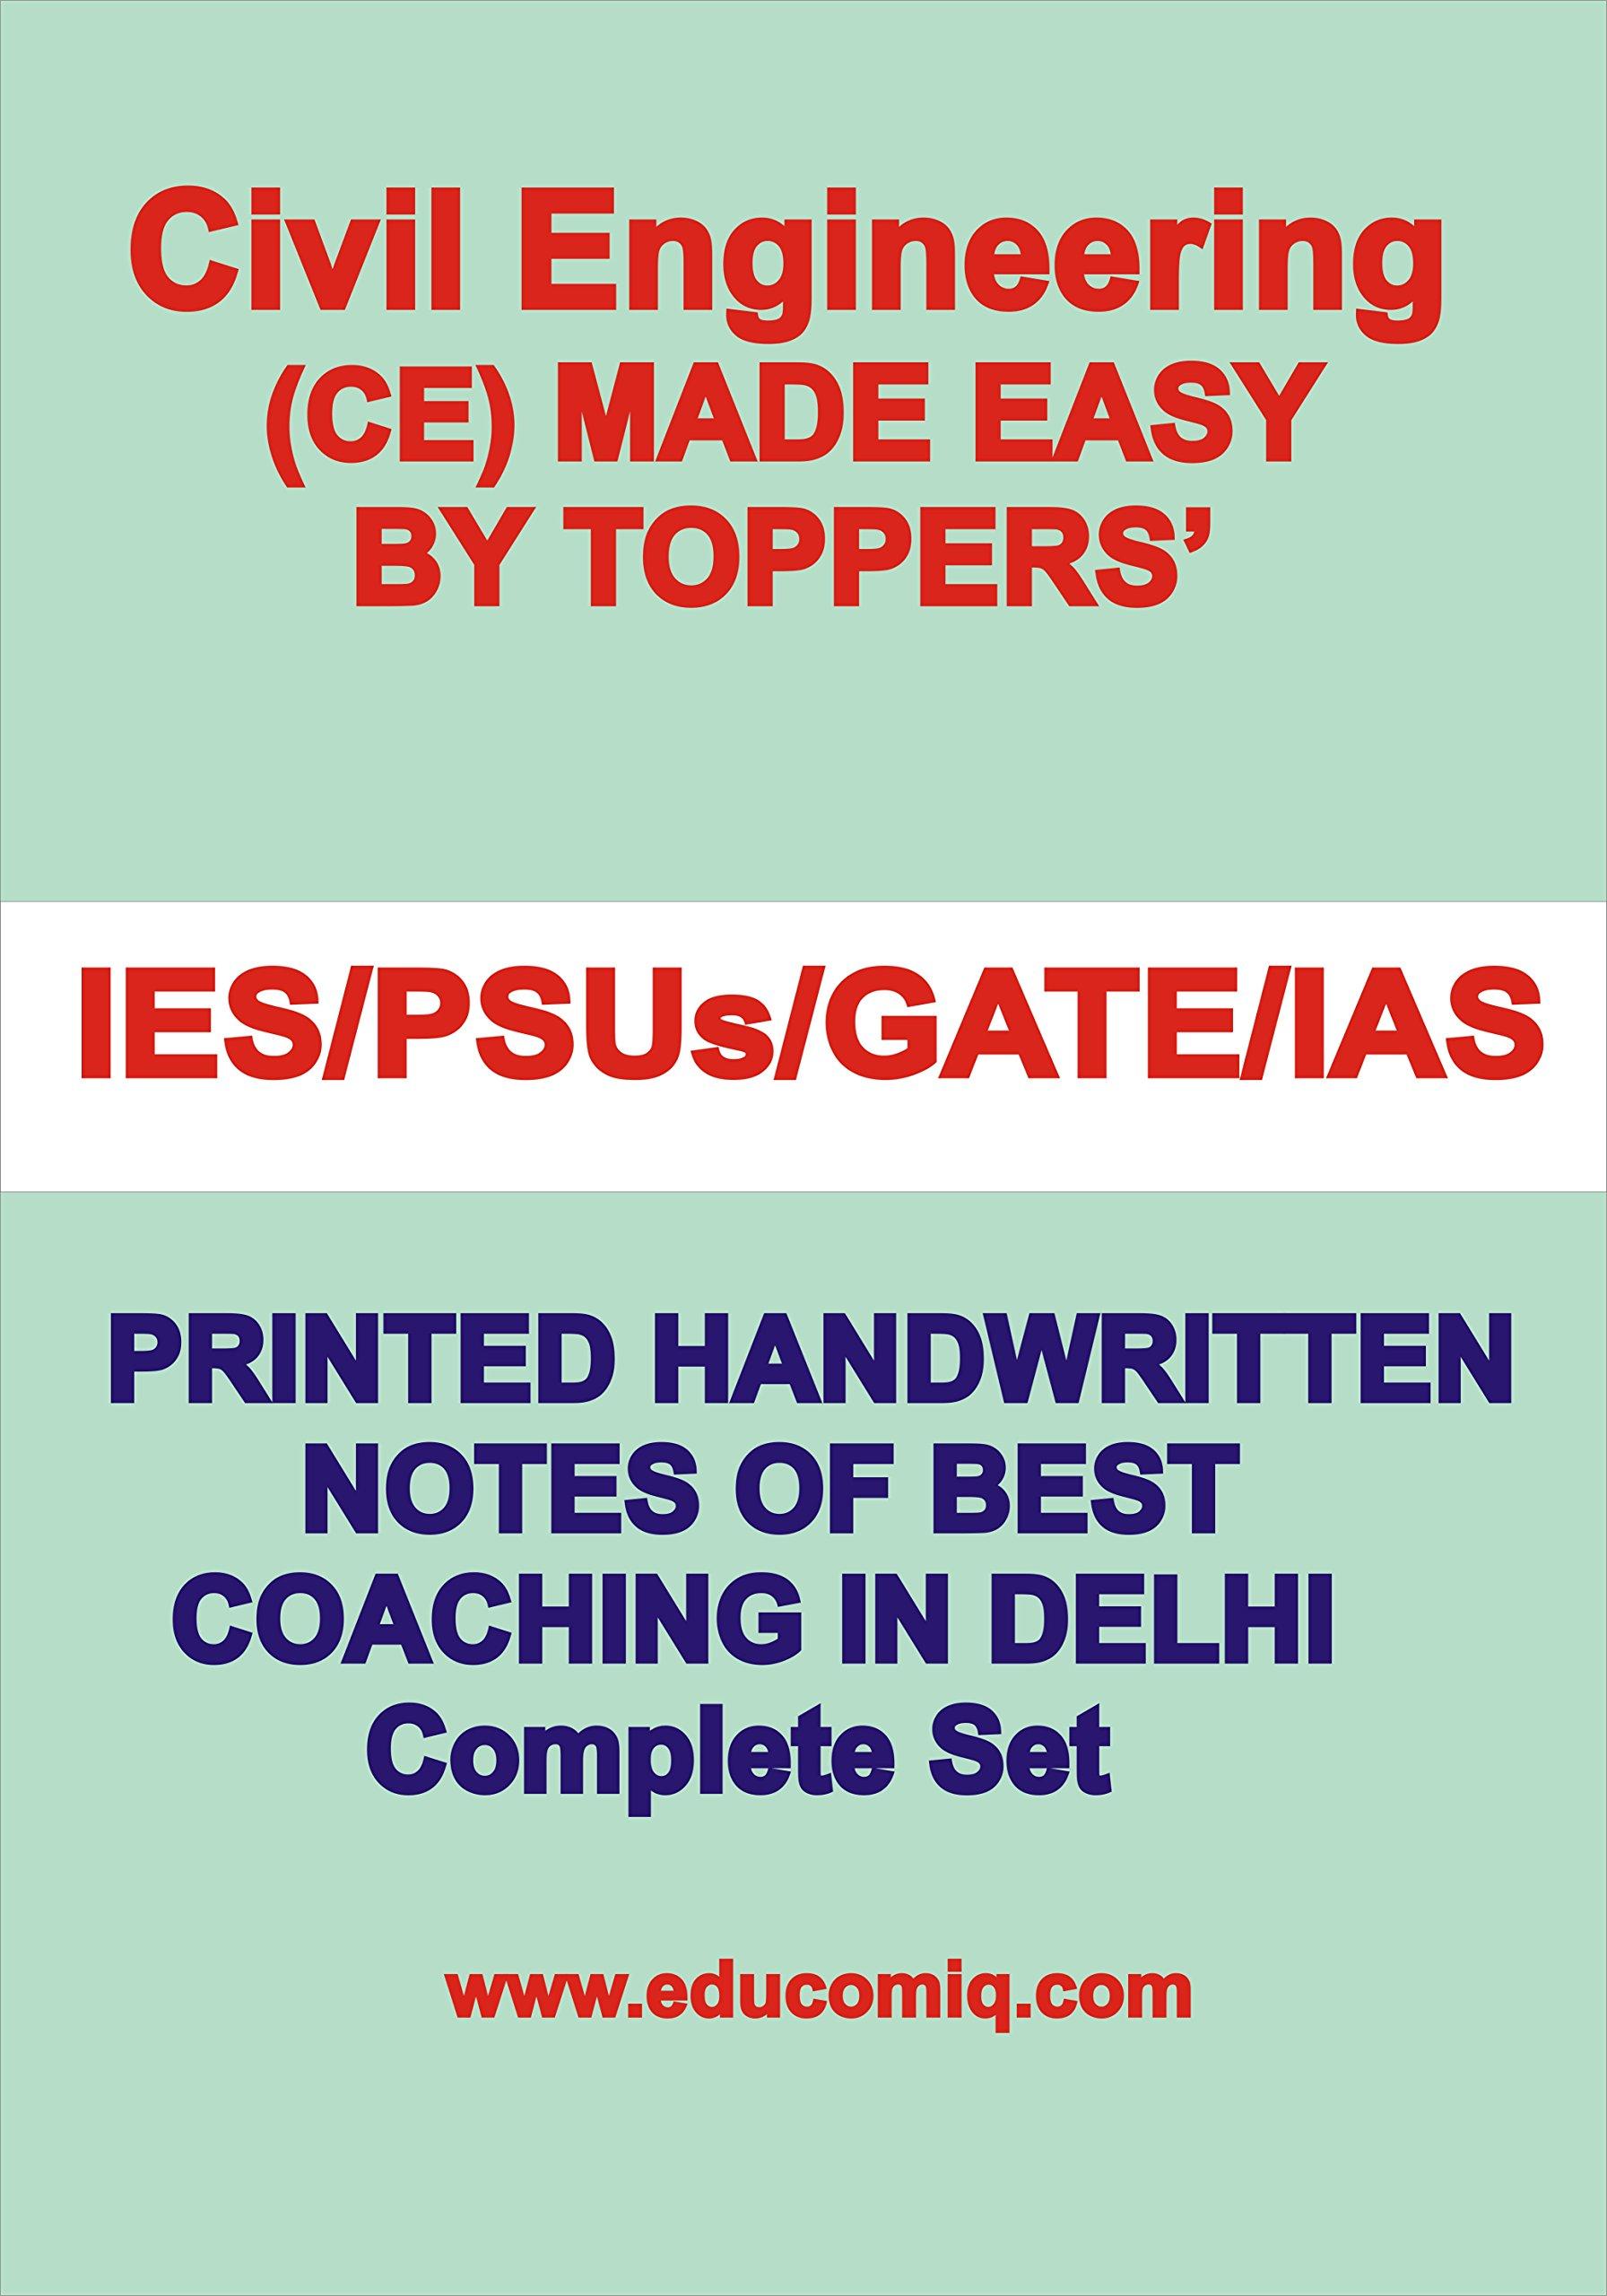 Buy Civil Engineering Handwritten Notes [IES] [GATE] [PSU] by Made